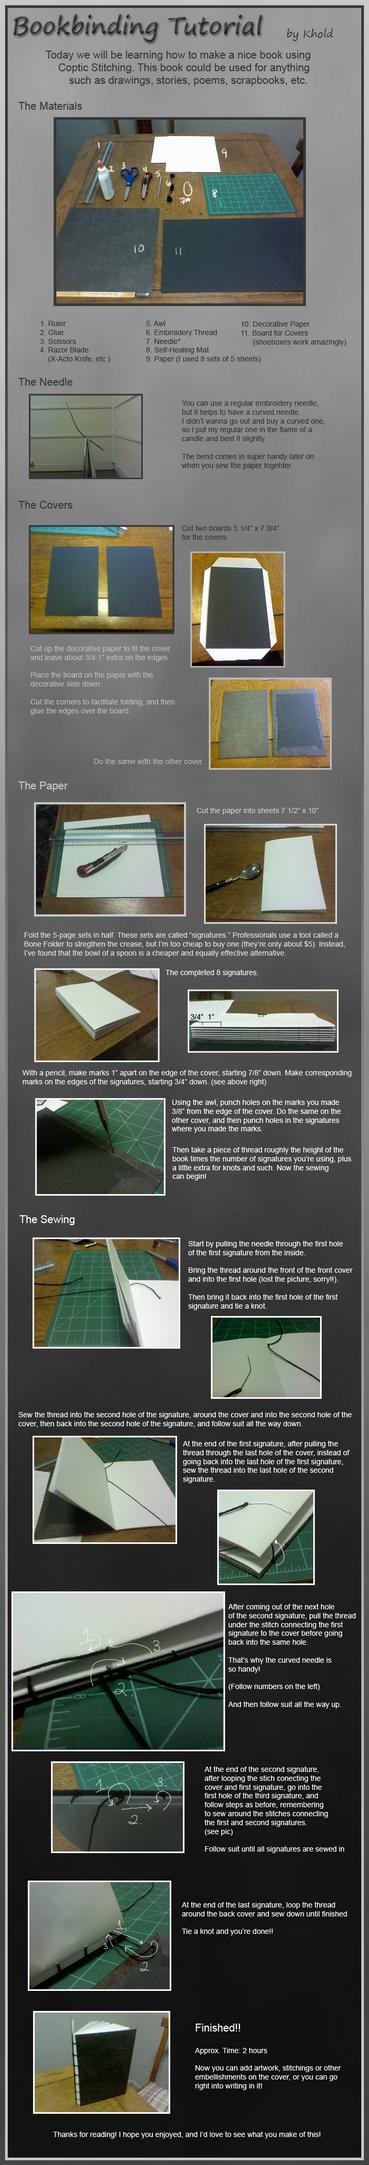 Bookbinding Tutorial by LightAesthetic